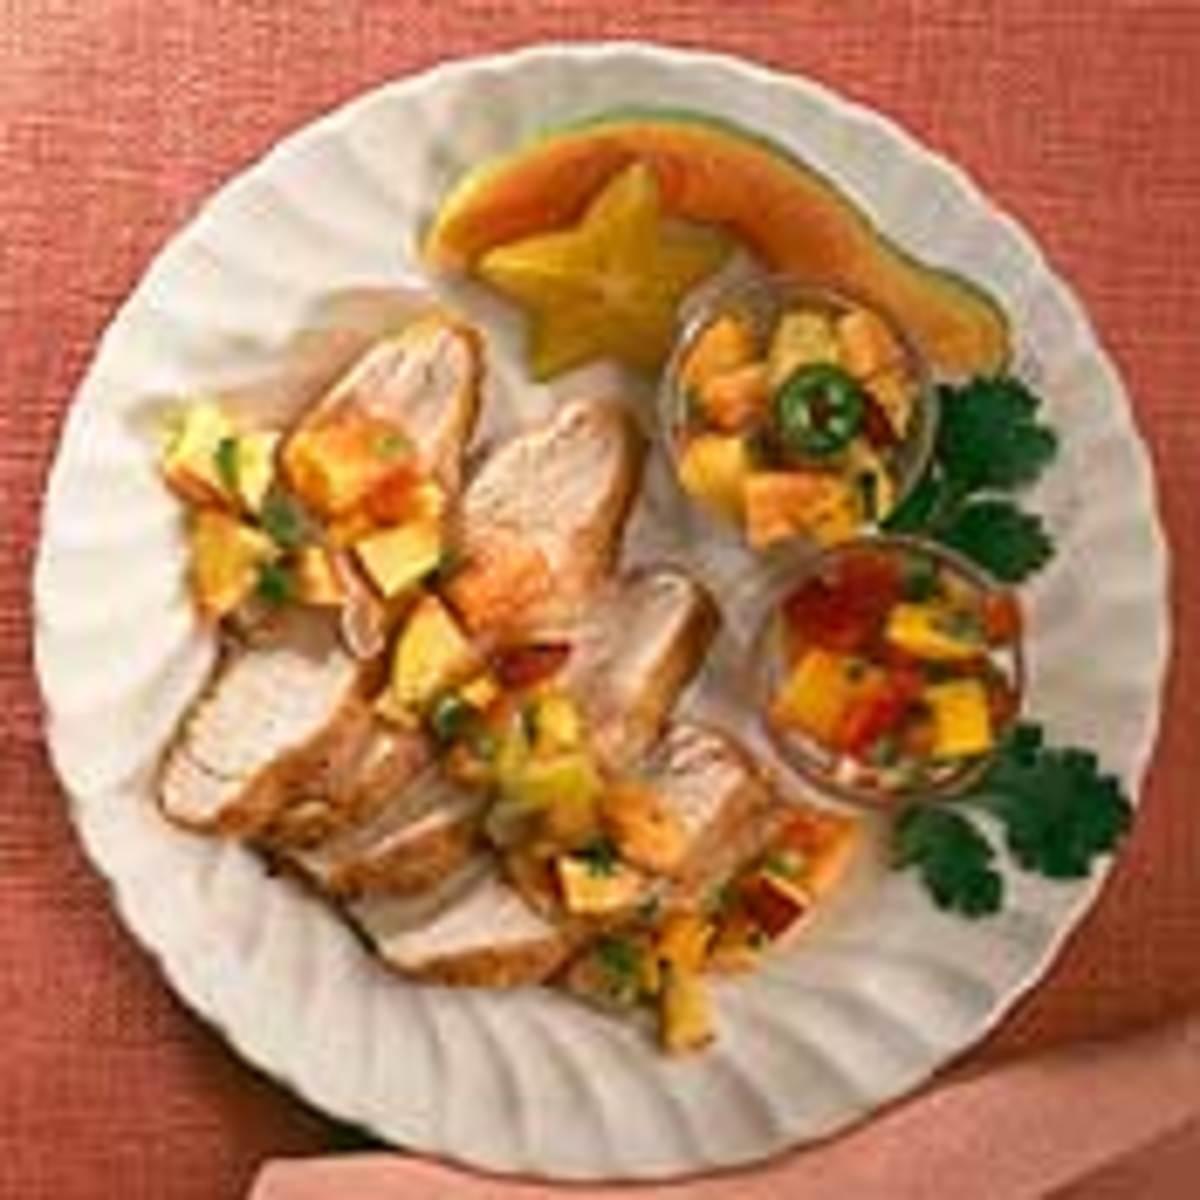 Sauteed Turkey Tenderloins with Fruit Salsas